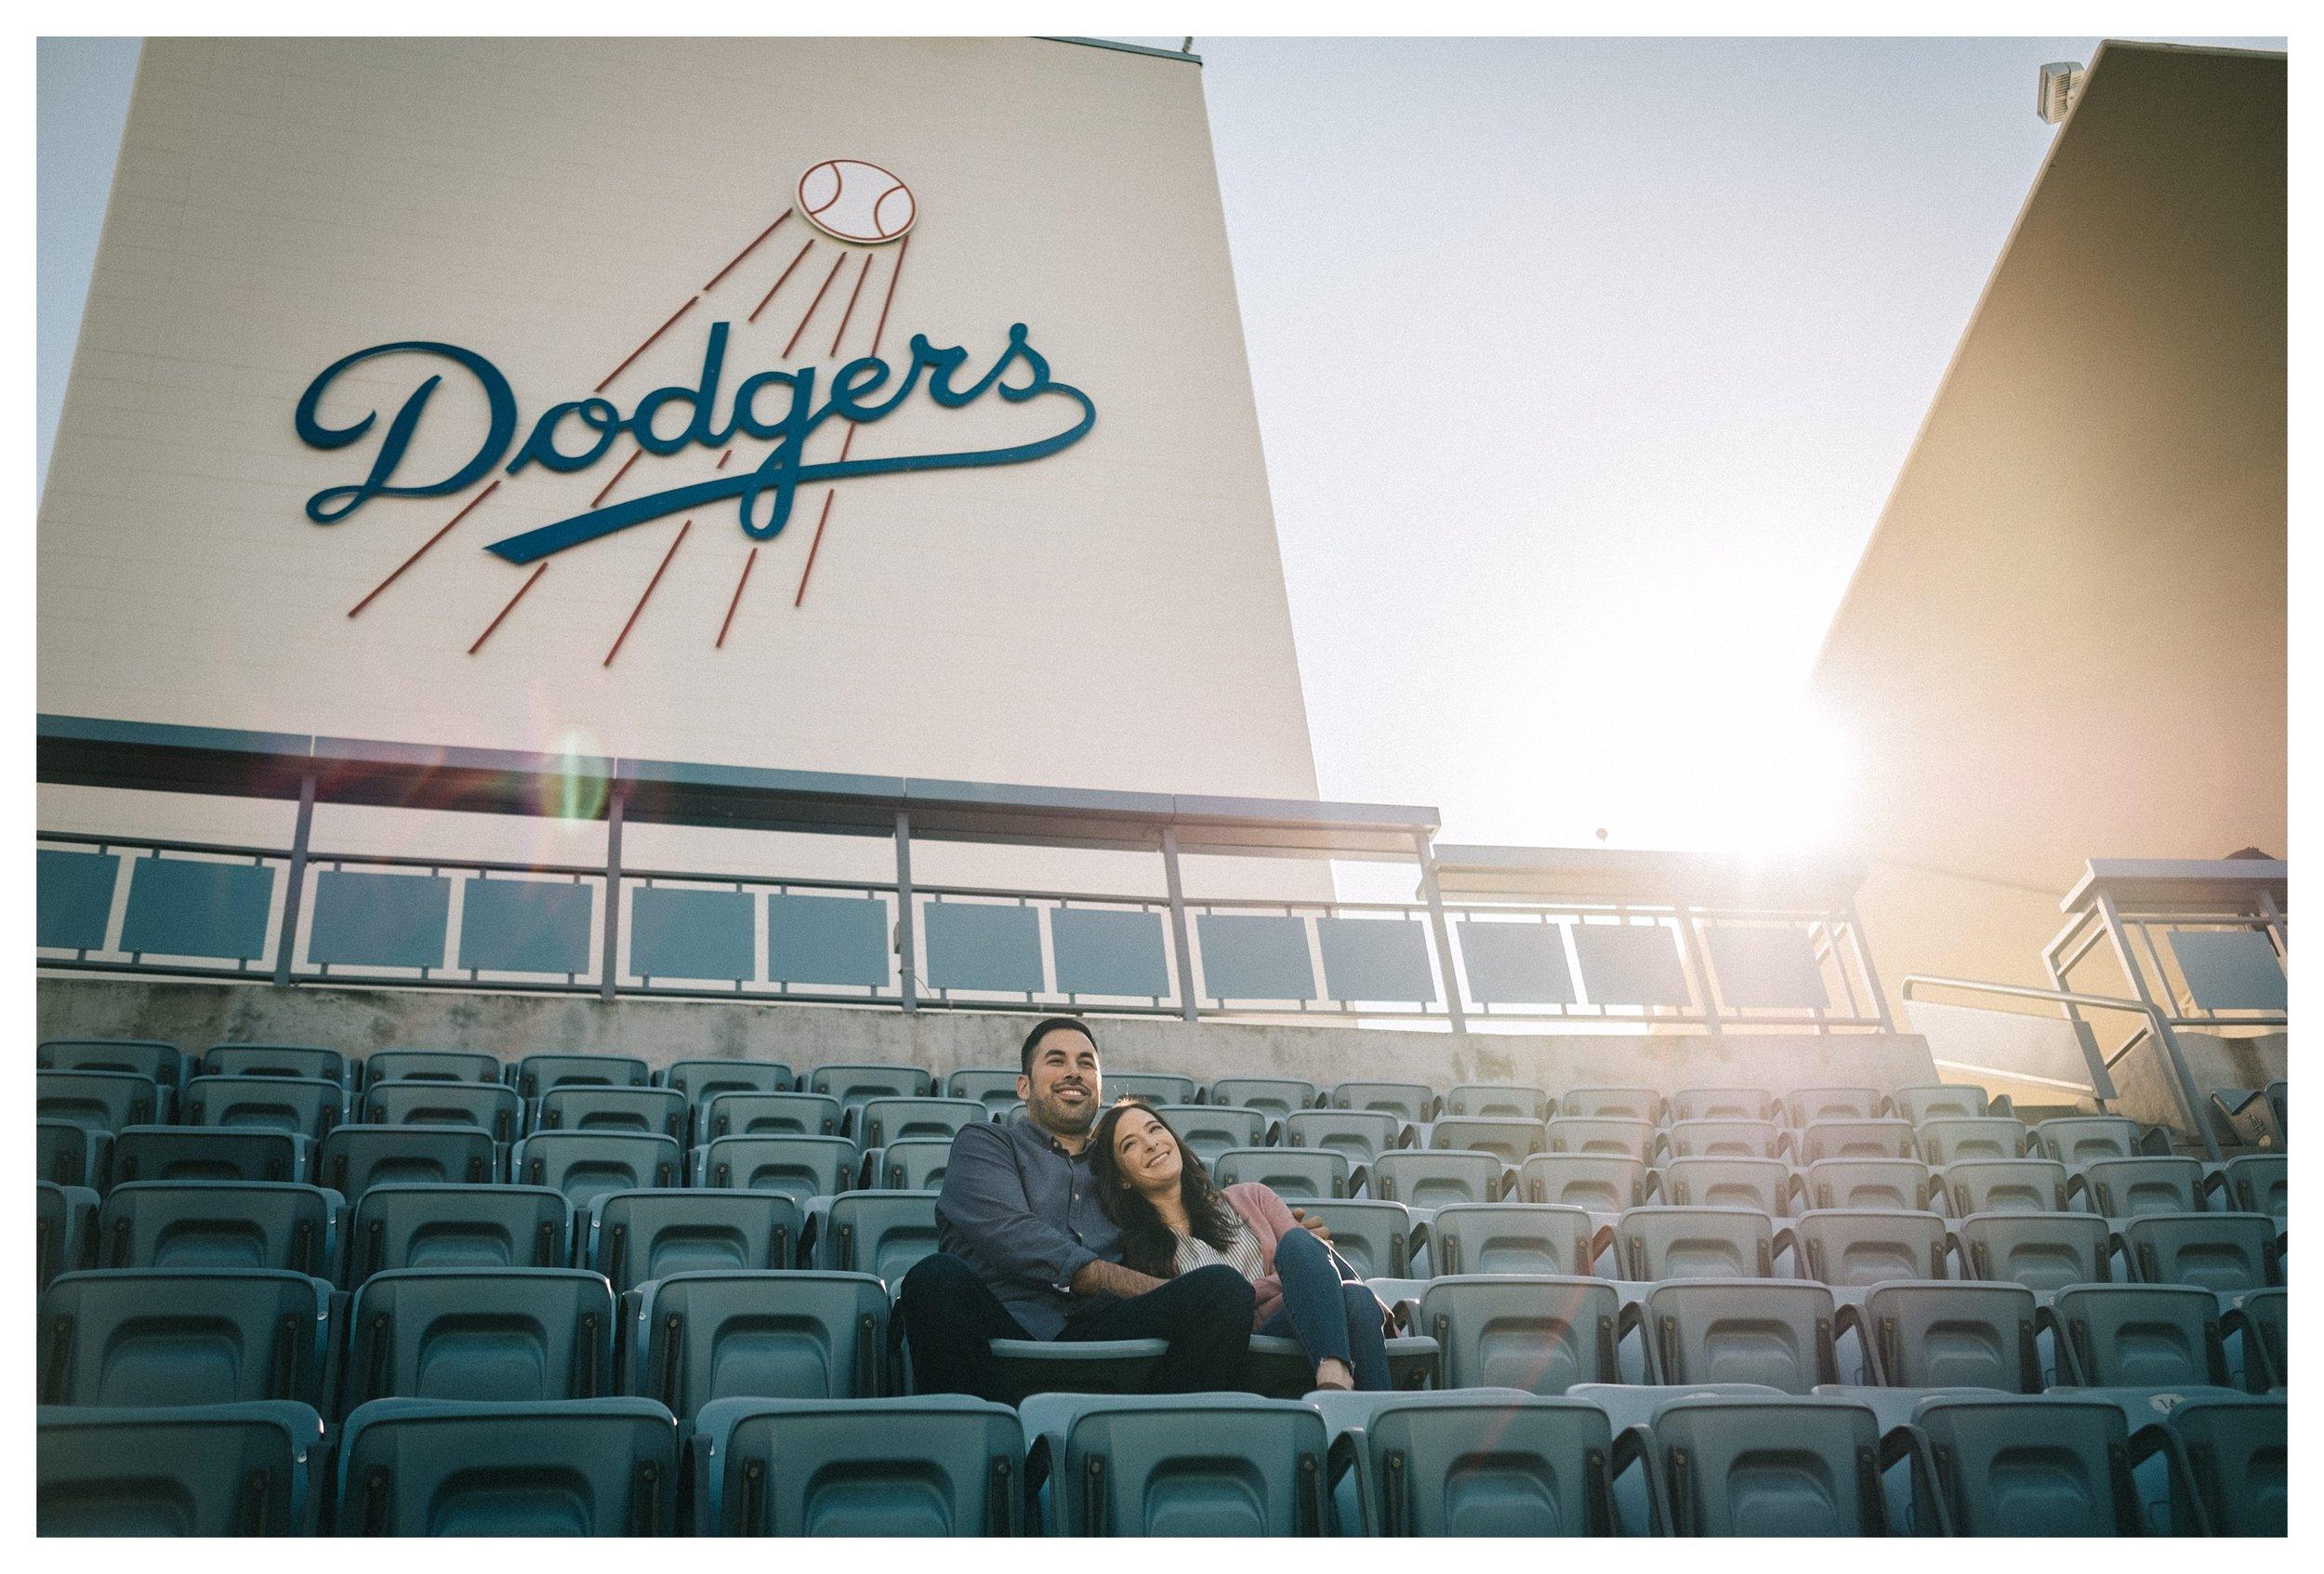 Dodger_Stadium_Engagement_Session_Nick_Mueller_Photography_2.jpg